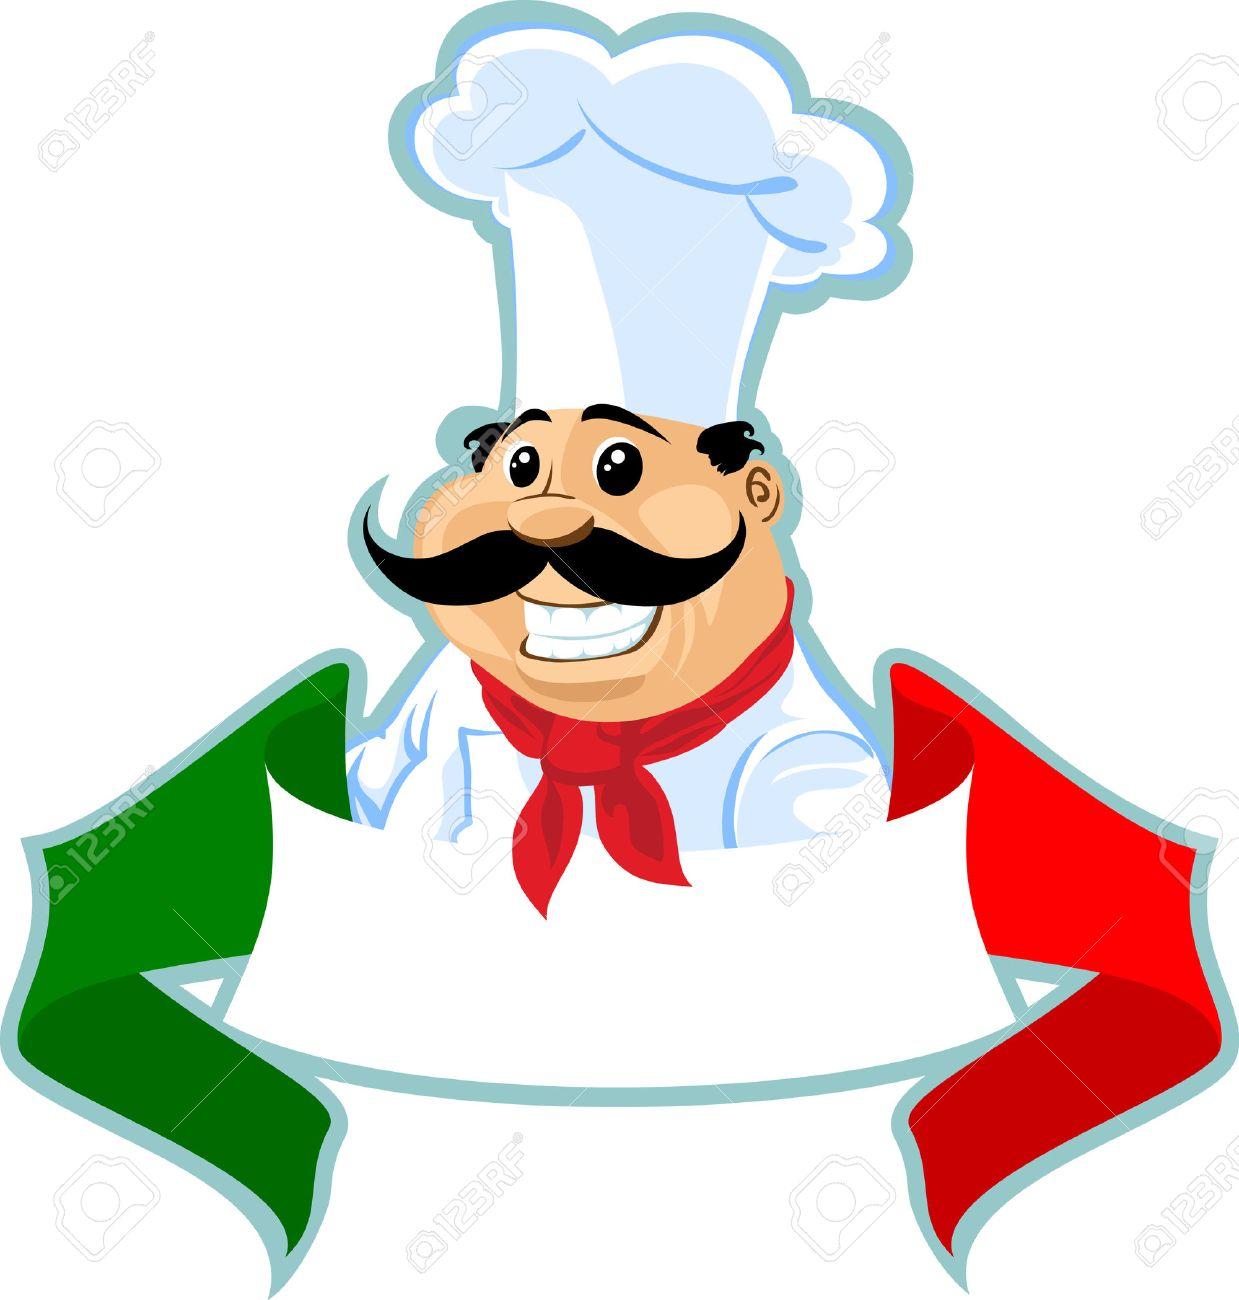 Italian Dinner Cliparts